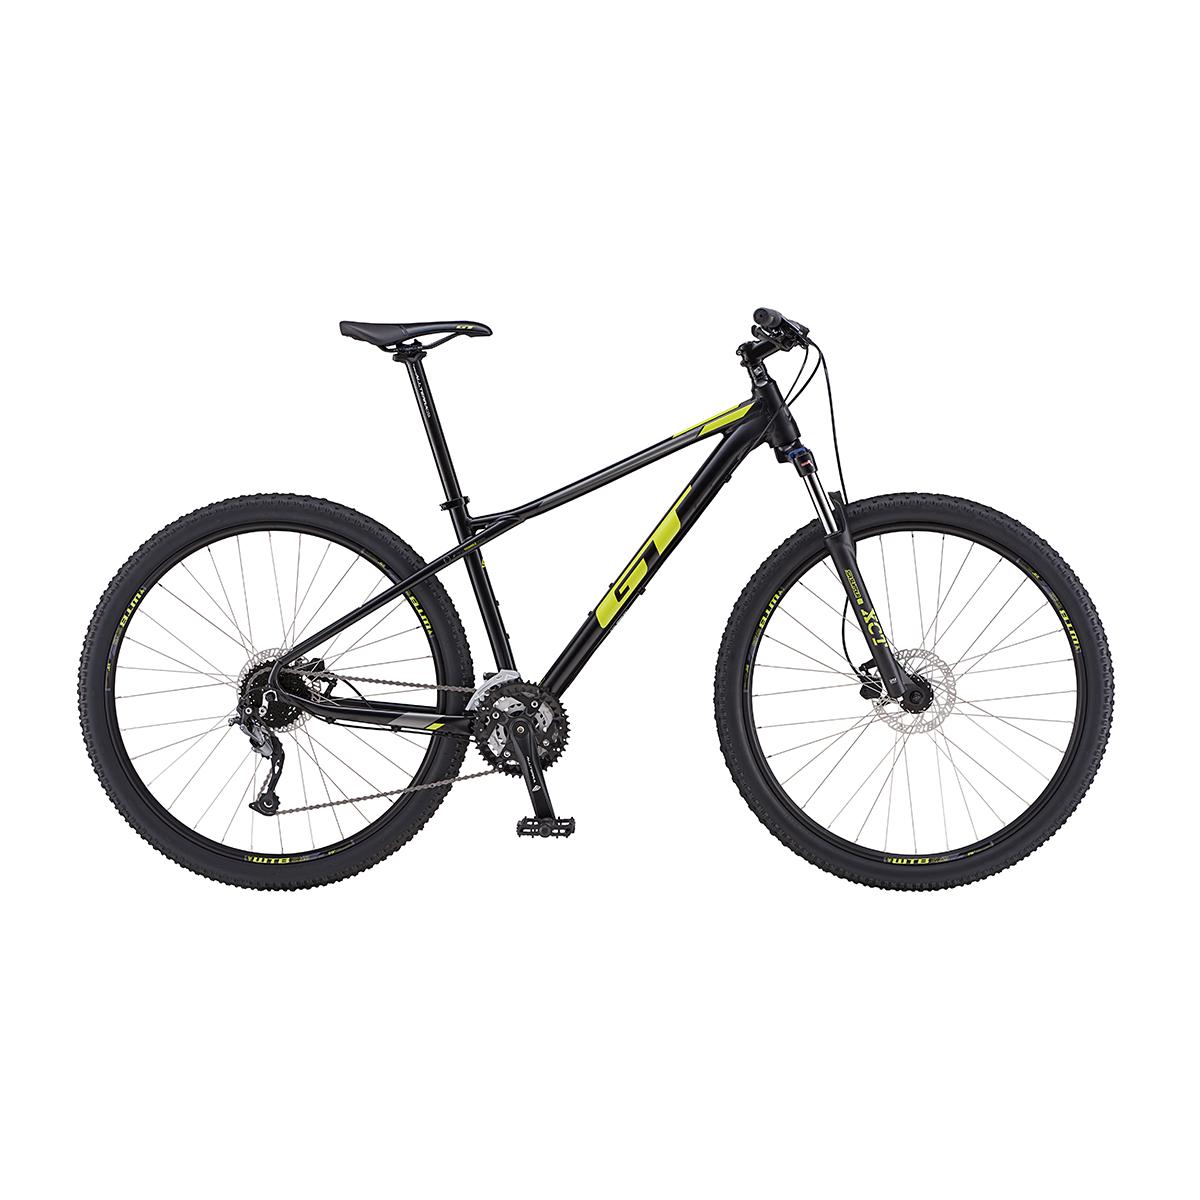 1200x1200 gt avalanche sport bike black cycleworx